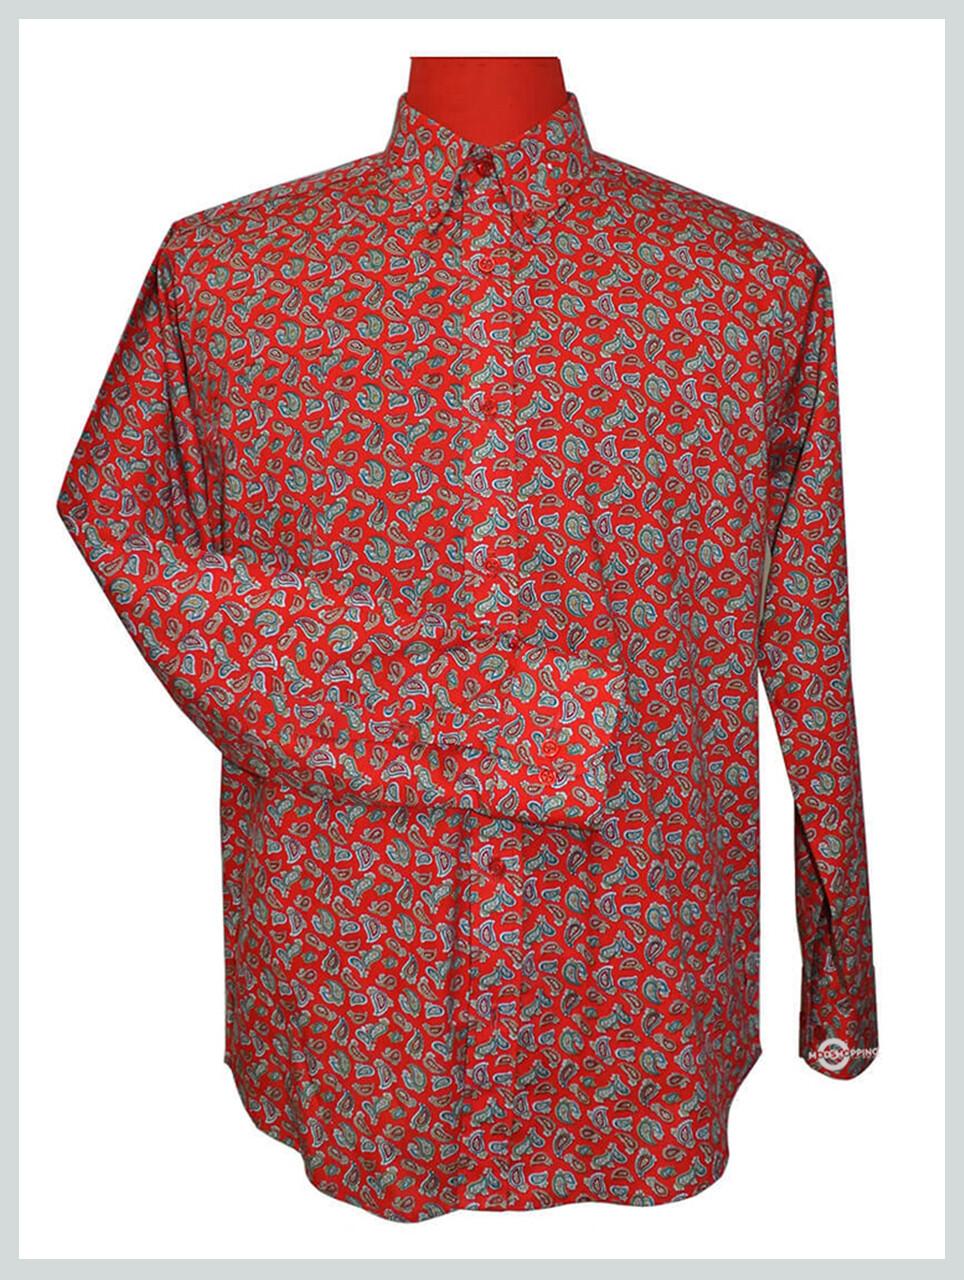 Paisley Shirt| 60s Vintage Style Red colour Mod Shirt